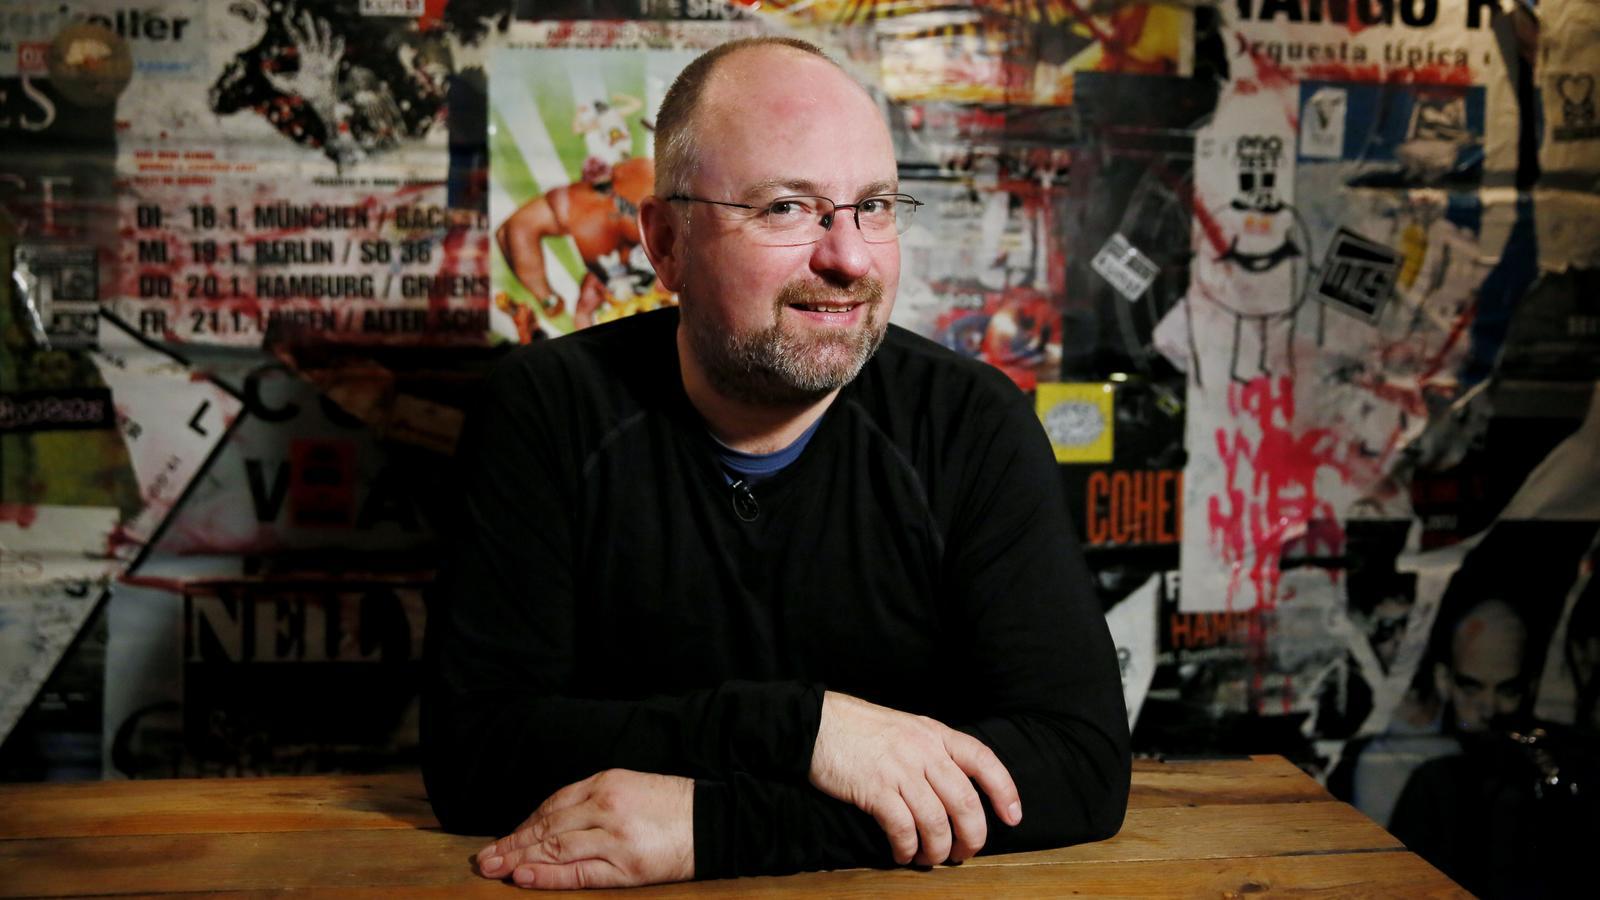 Koch Christian Lohse